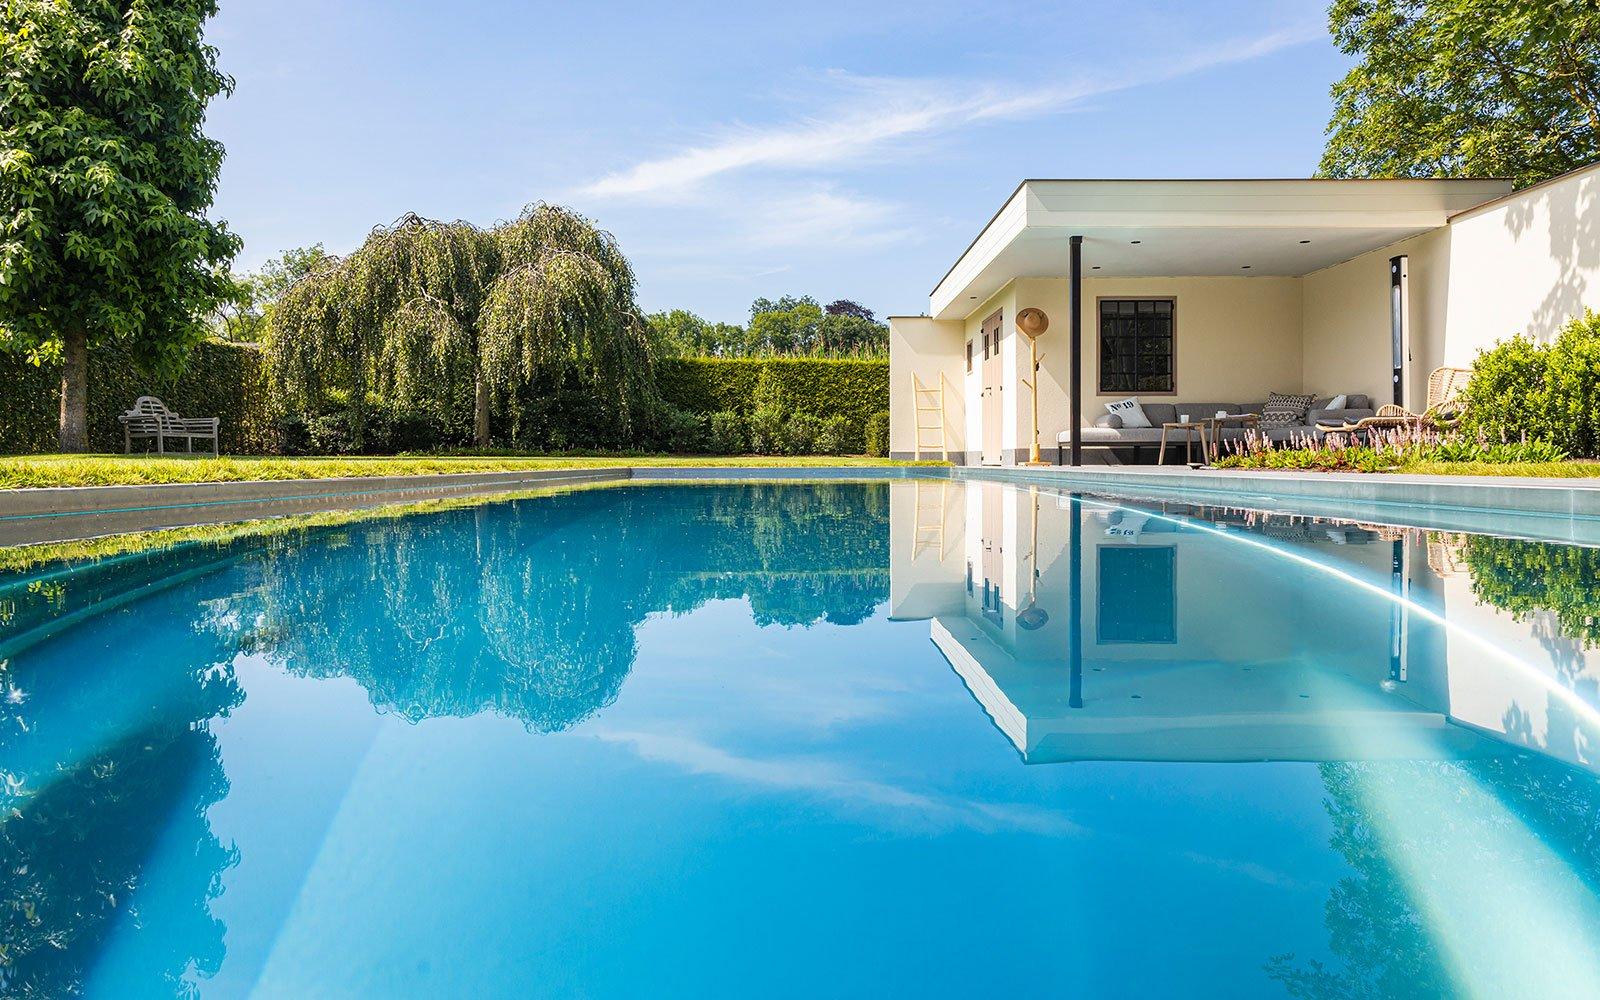 Zwembad in de tuin, Nouveau, zwembad, groen, tuin, zomer, the Art of Living